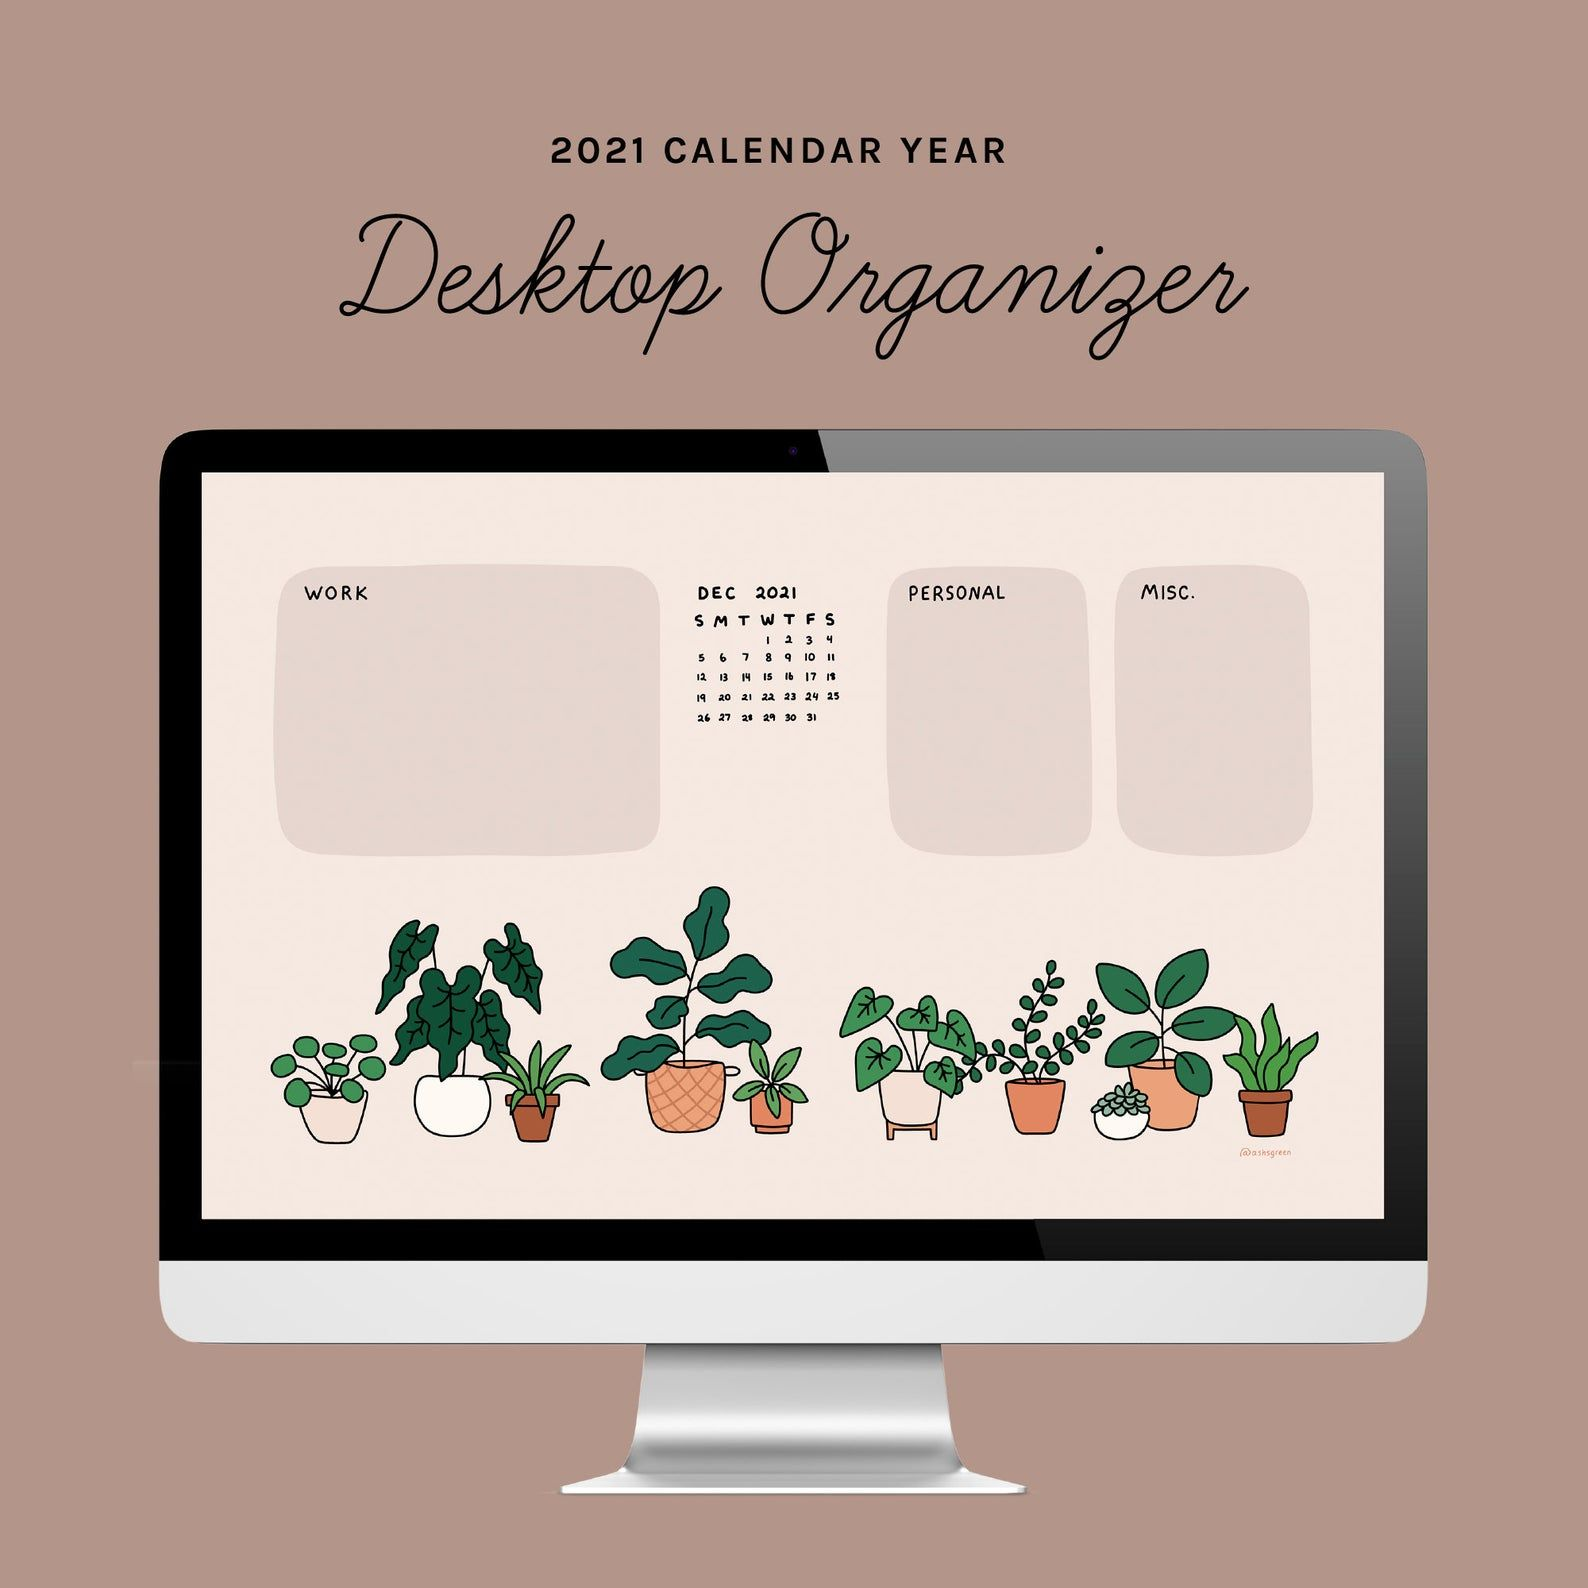 Desktop Wallpaper Organizer Cream Plants Theme For Small Etsy In 2021 Desktop Wallpaper Organizer Computer Wallpaper Desktop Wallpapers Desktop Wallpaper Desktop wallpaper organizer with